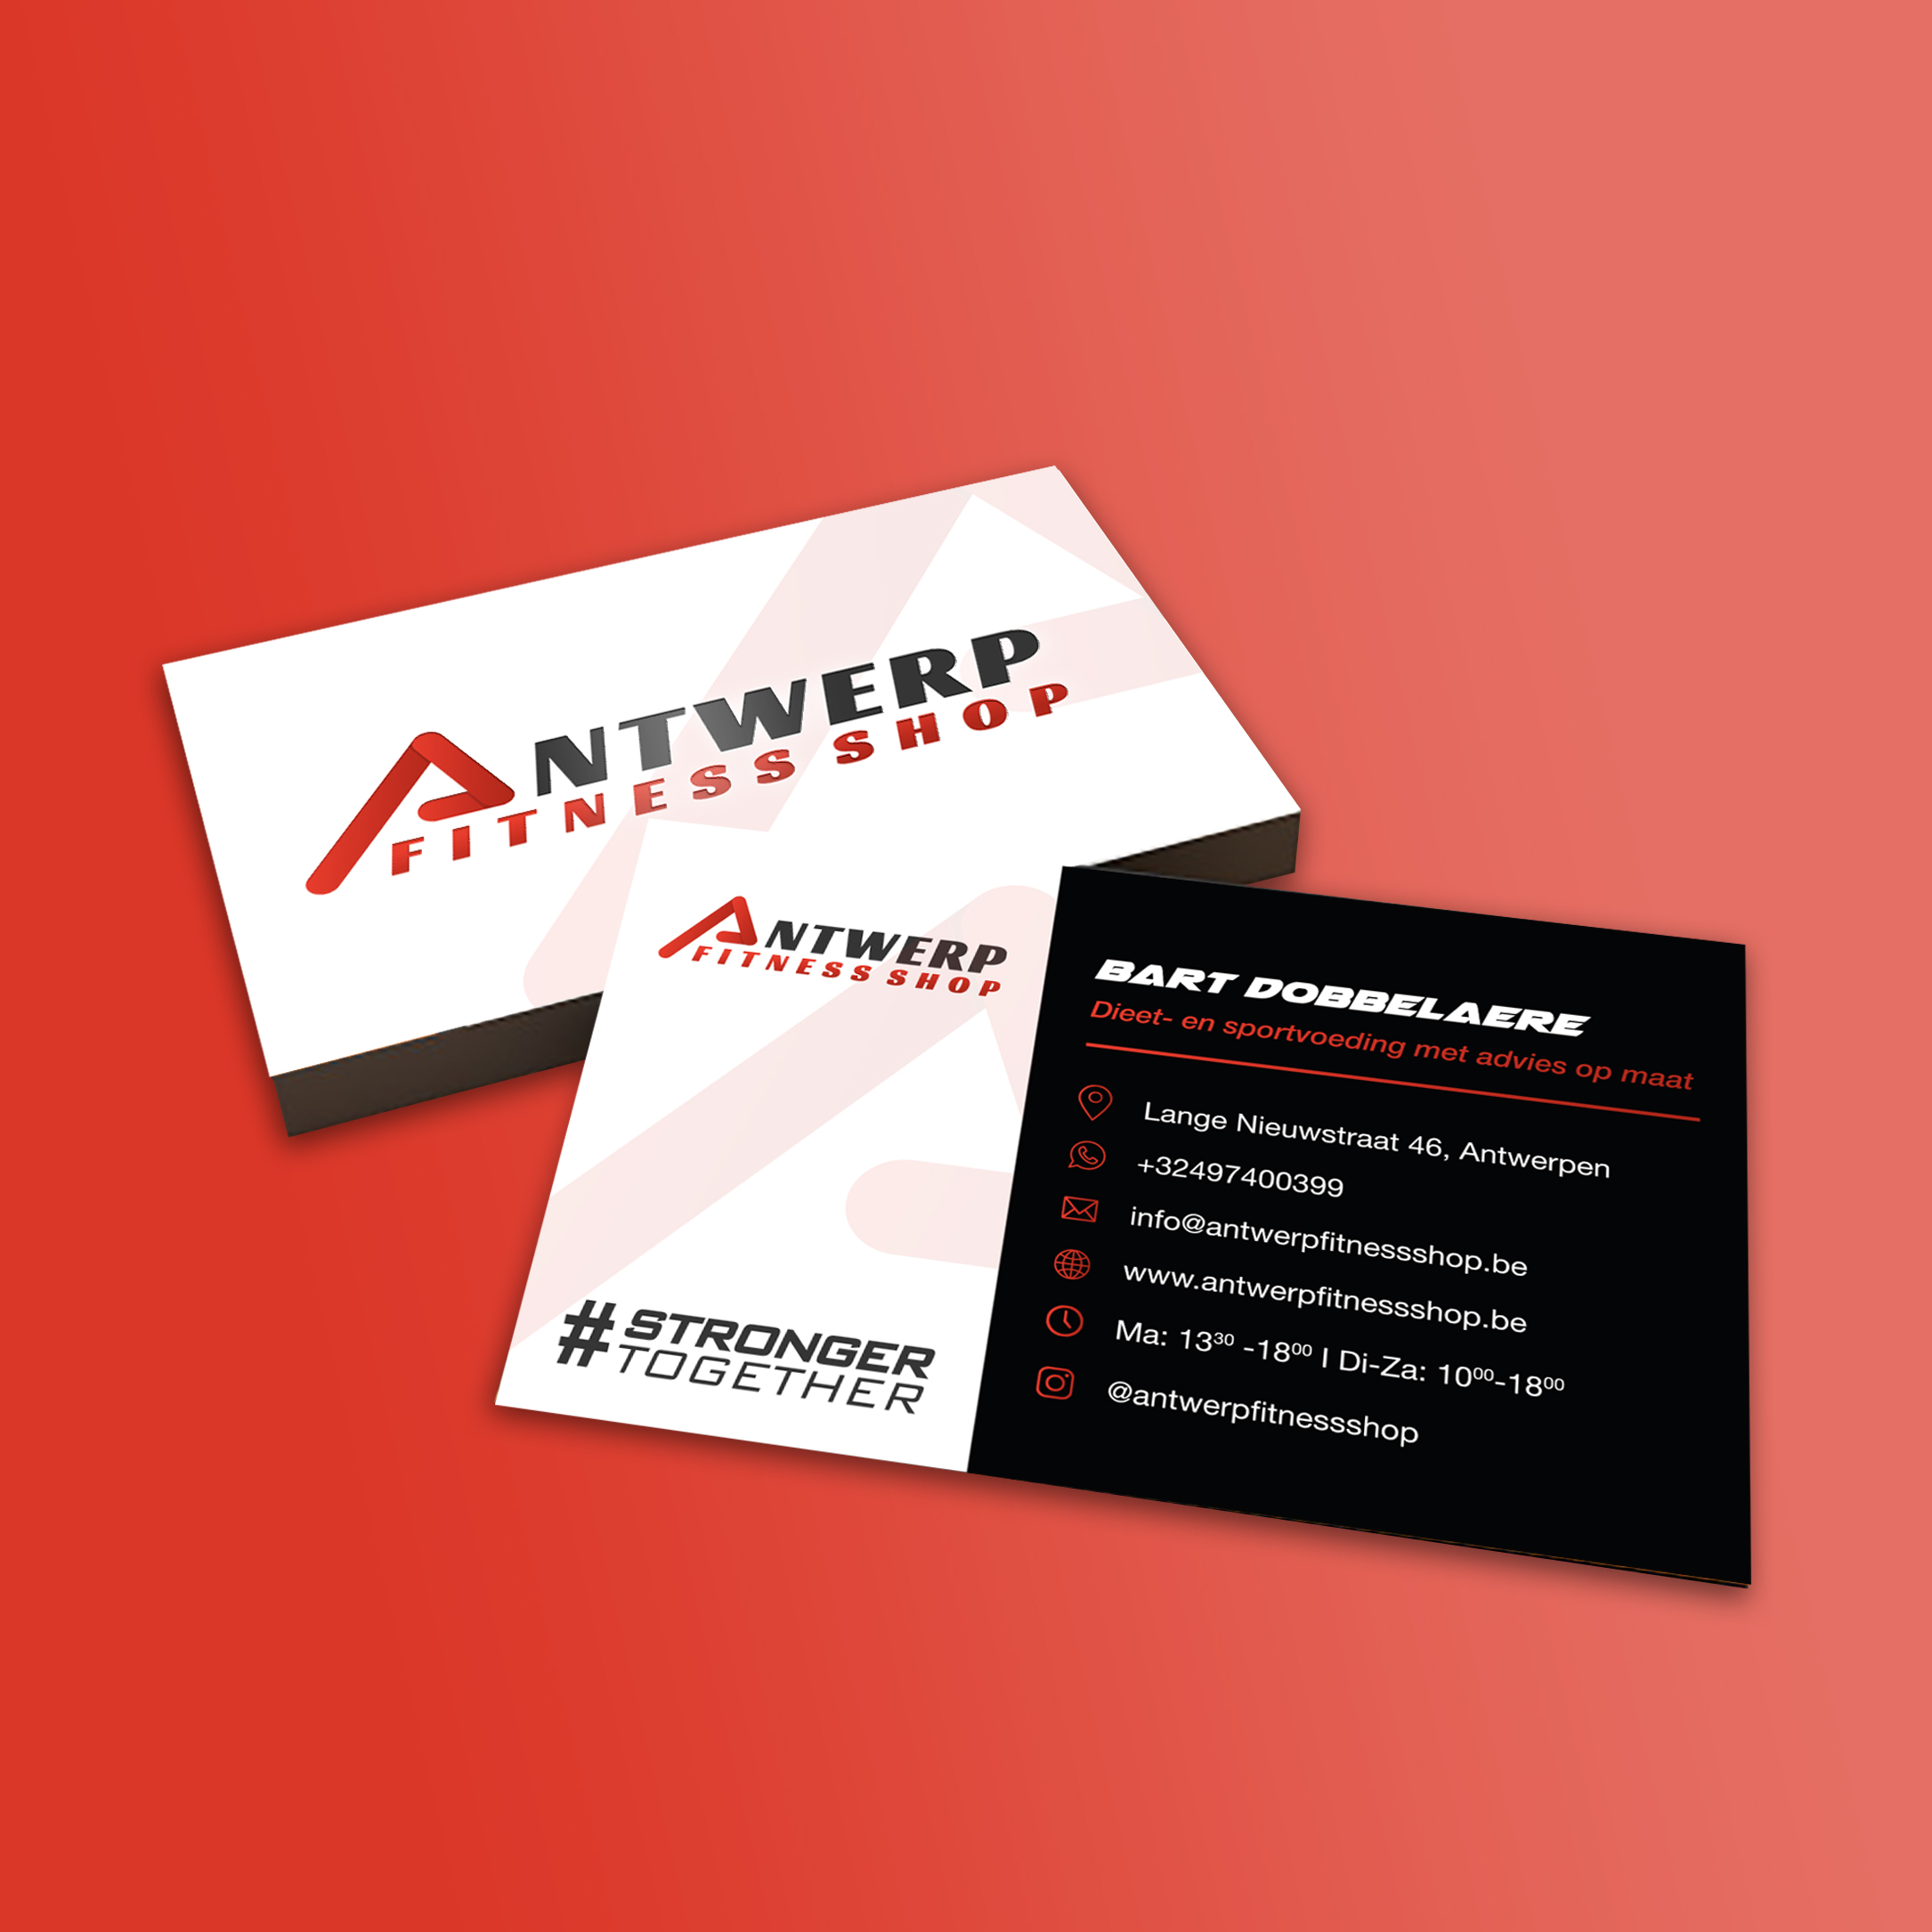 elegant-realistic-wooden-background-business-card-mockup_1094-53